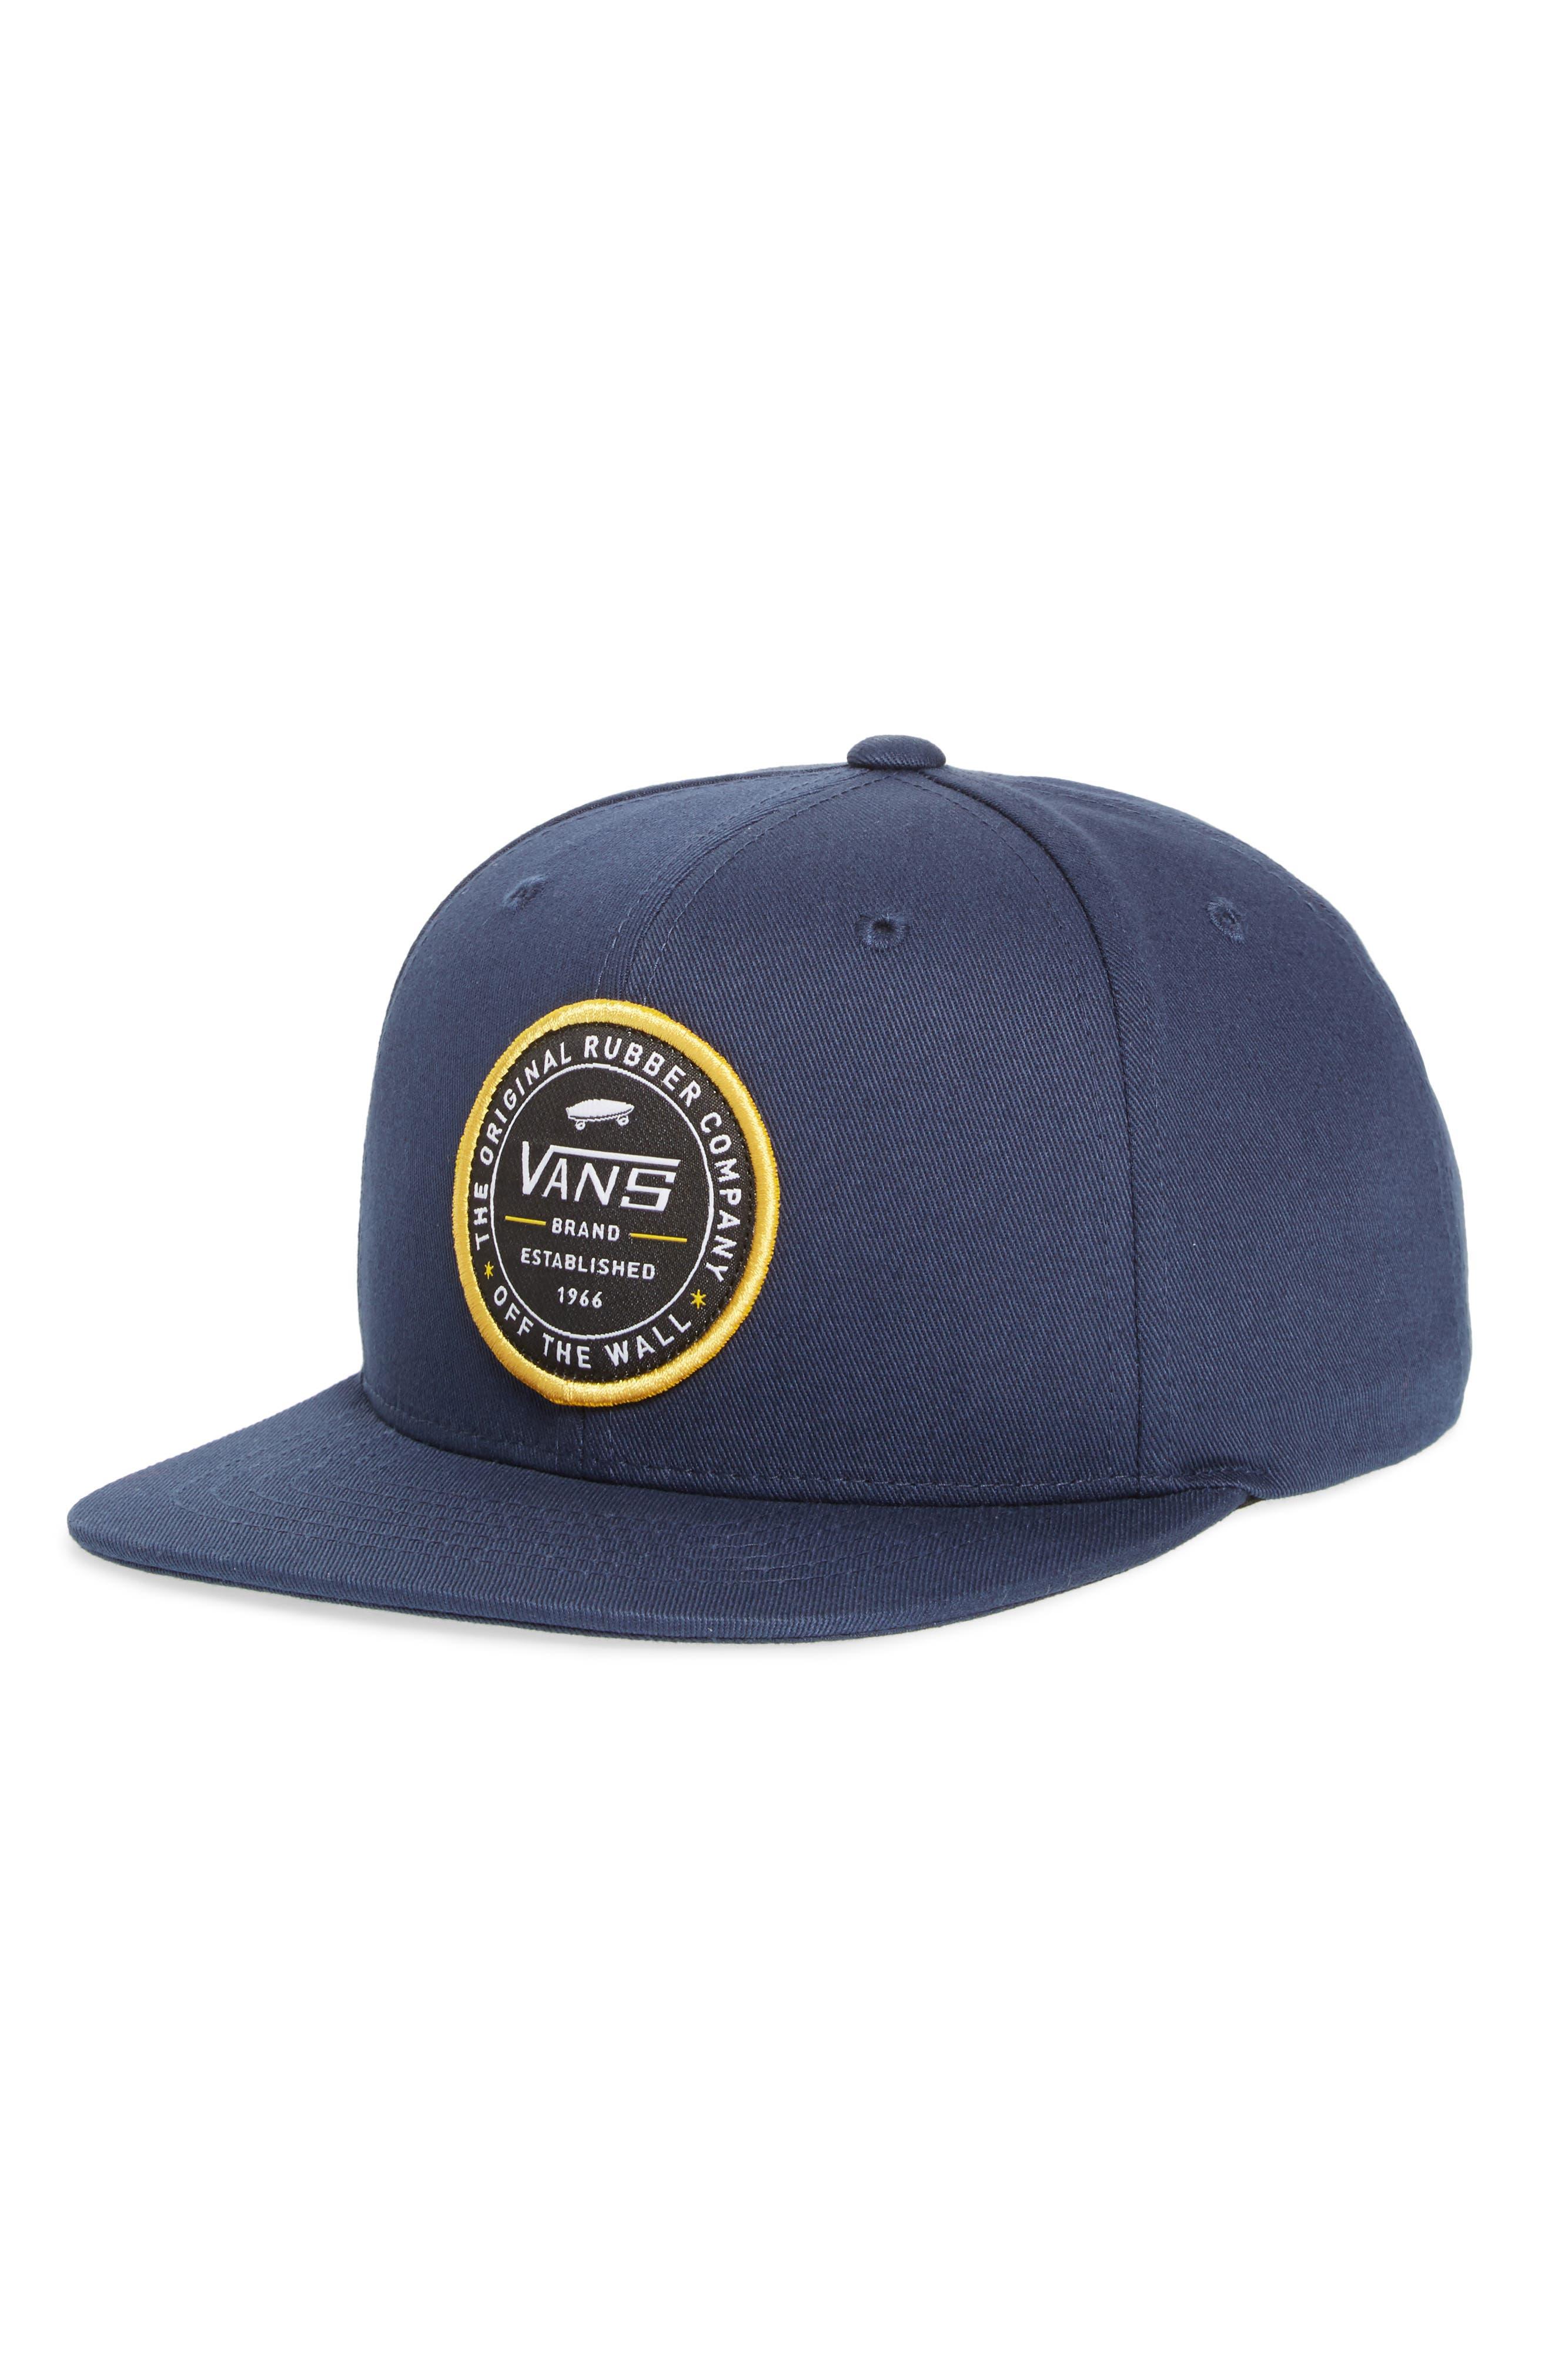 Established 66 Snapback Cap,                         Main,                         color, 401